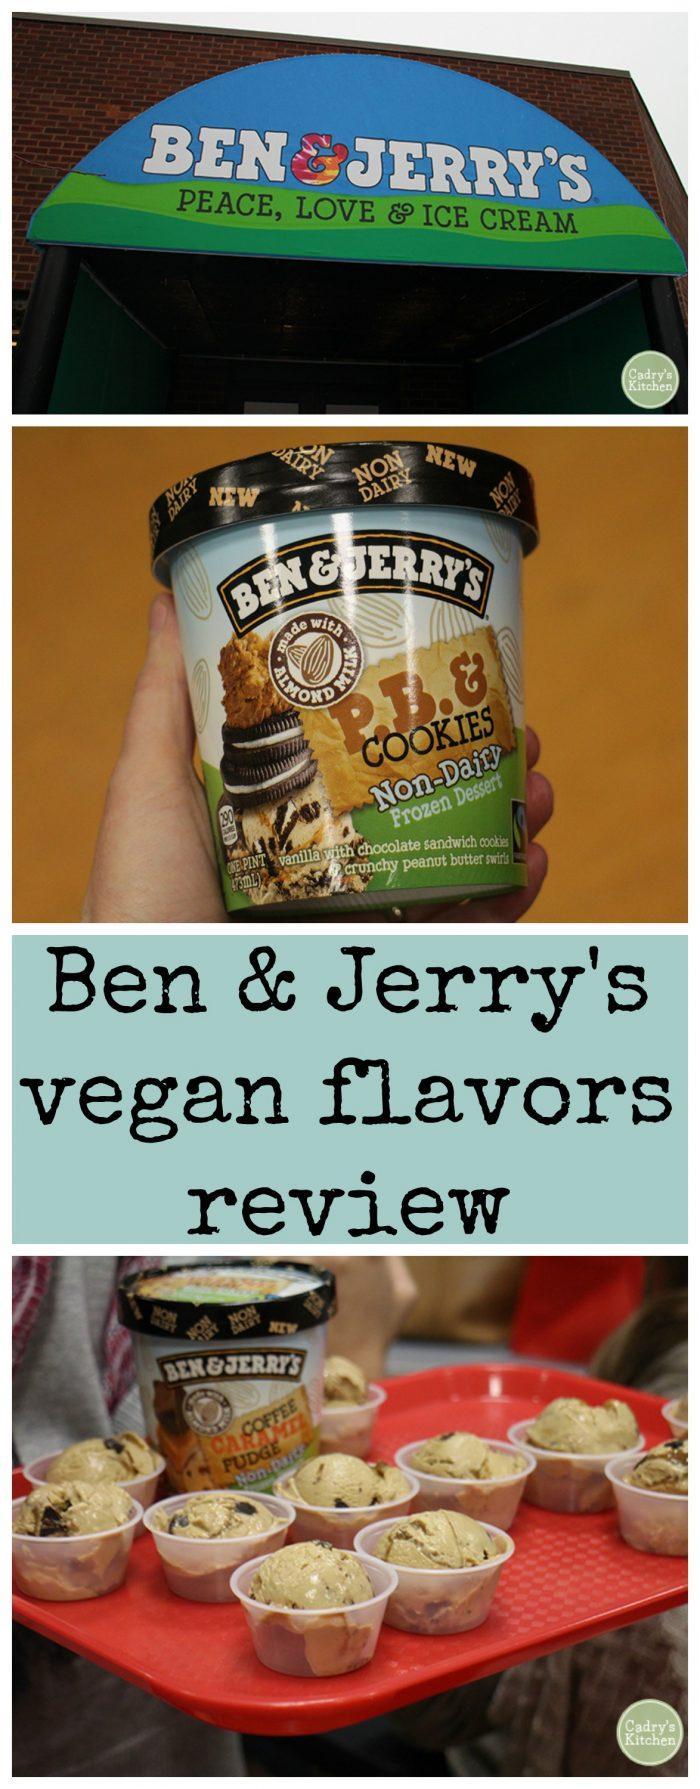 Ben and Jerry's new vegan ice cream - Review & video!   cadryskitchen.com